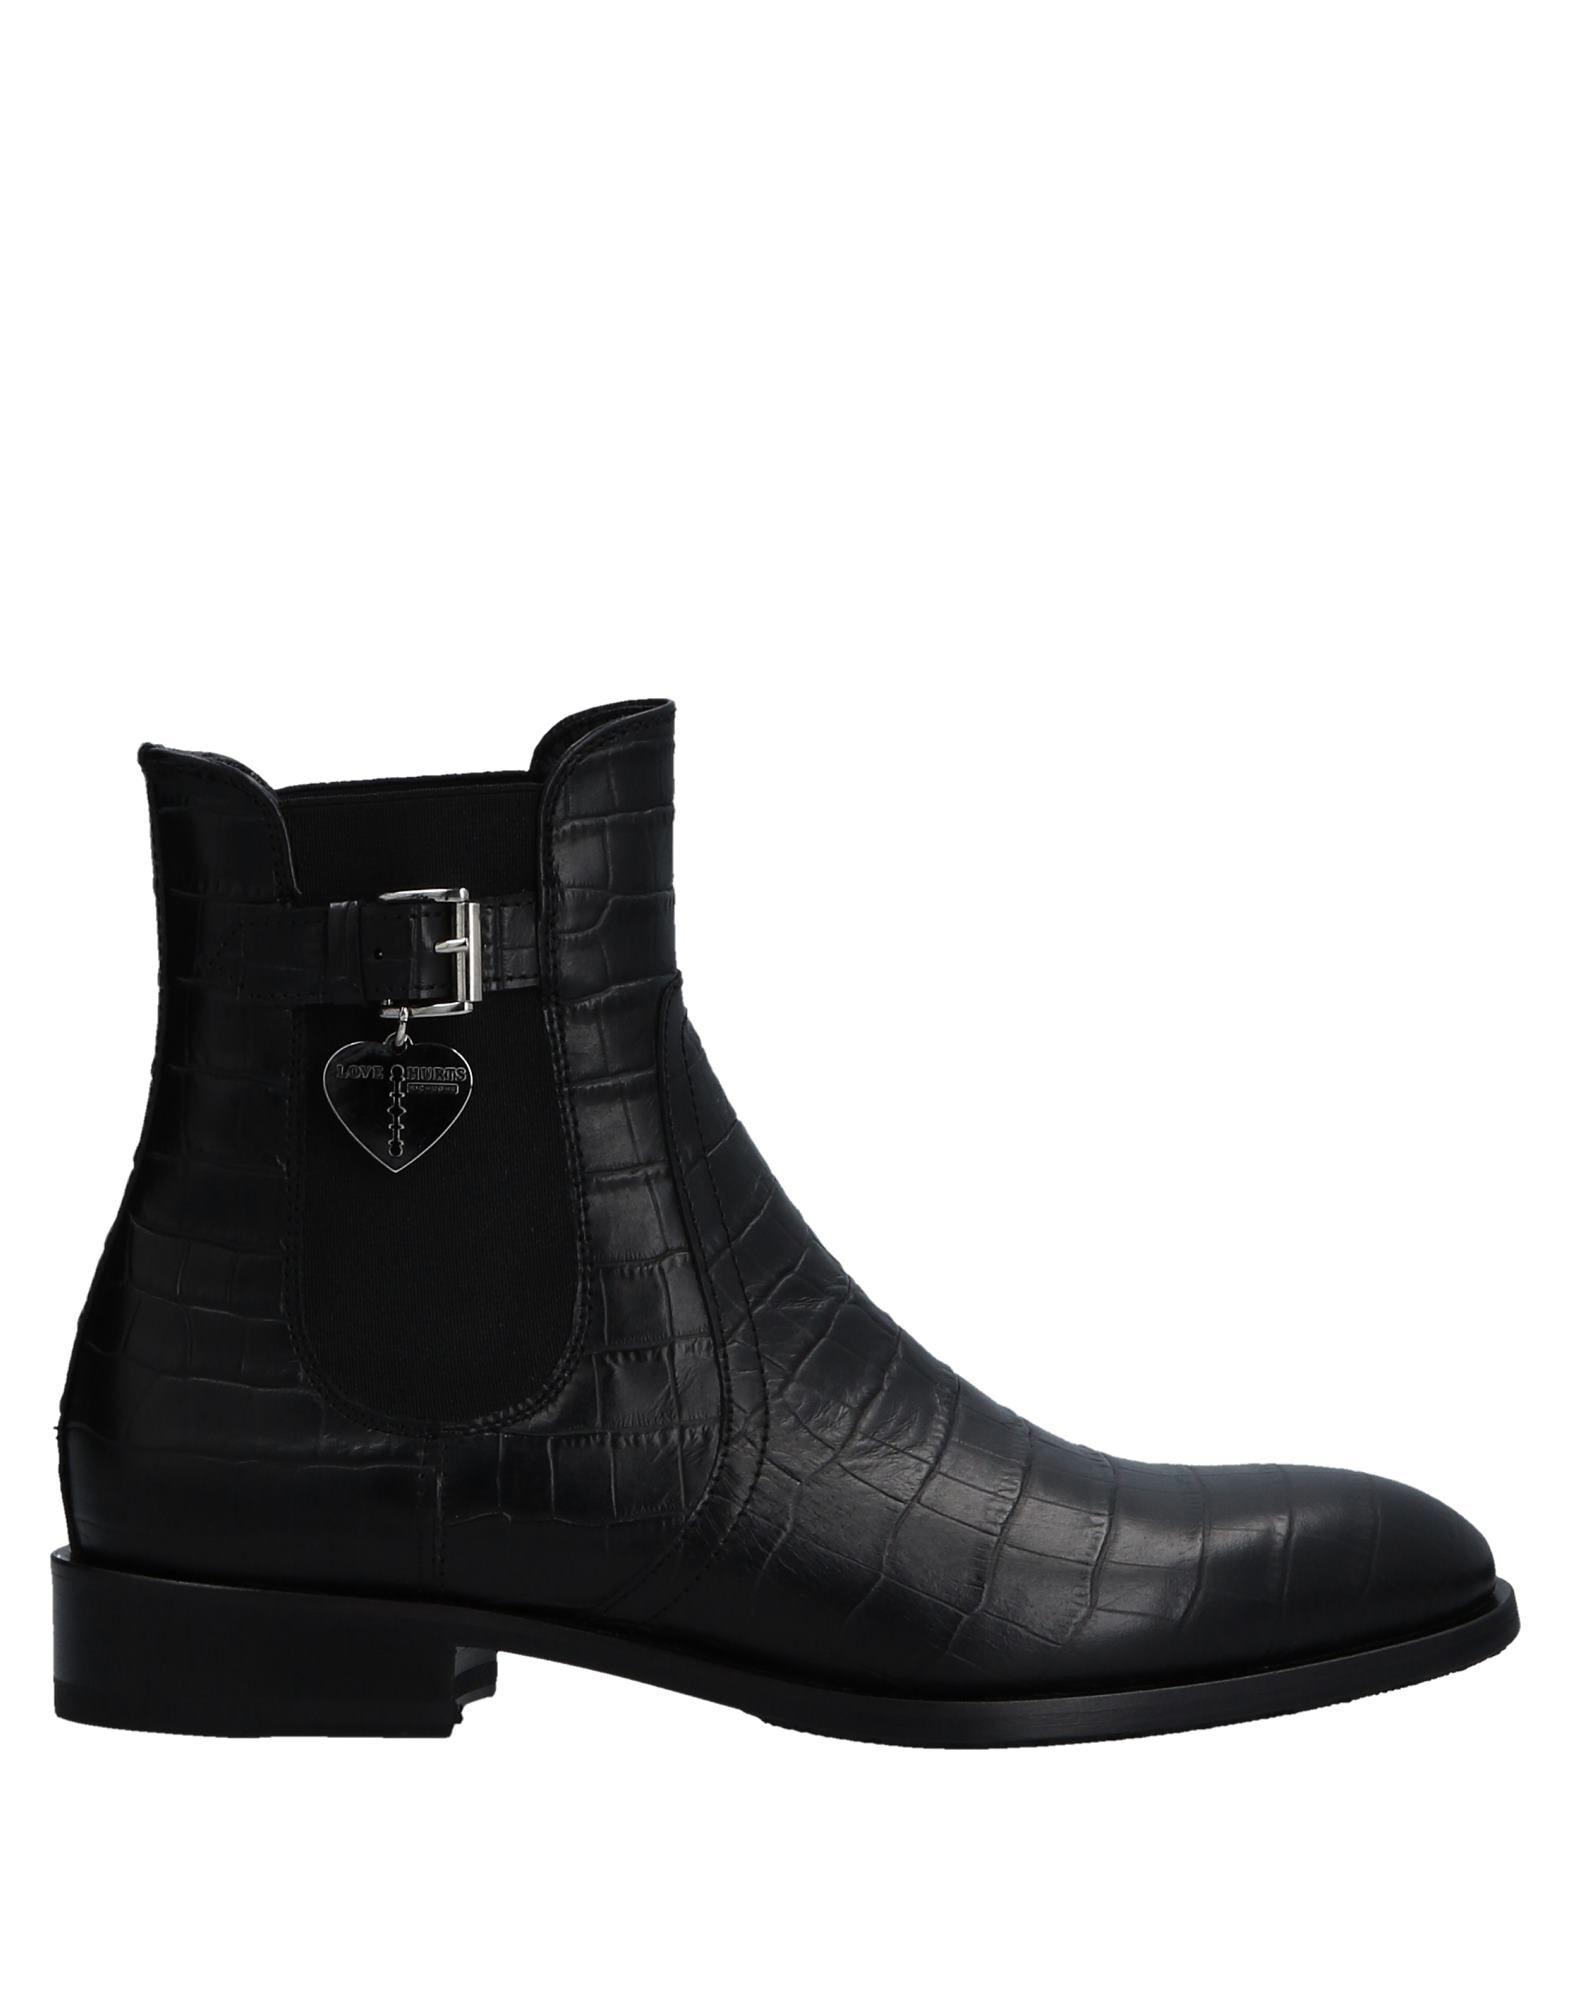 Rabatt Schuhe 11515296RI Richmond Stiefelette Damen  11515296RI Schuhe 03ee2b